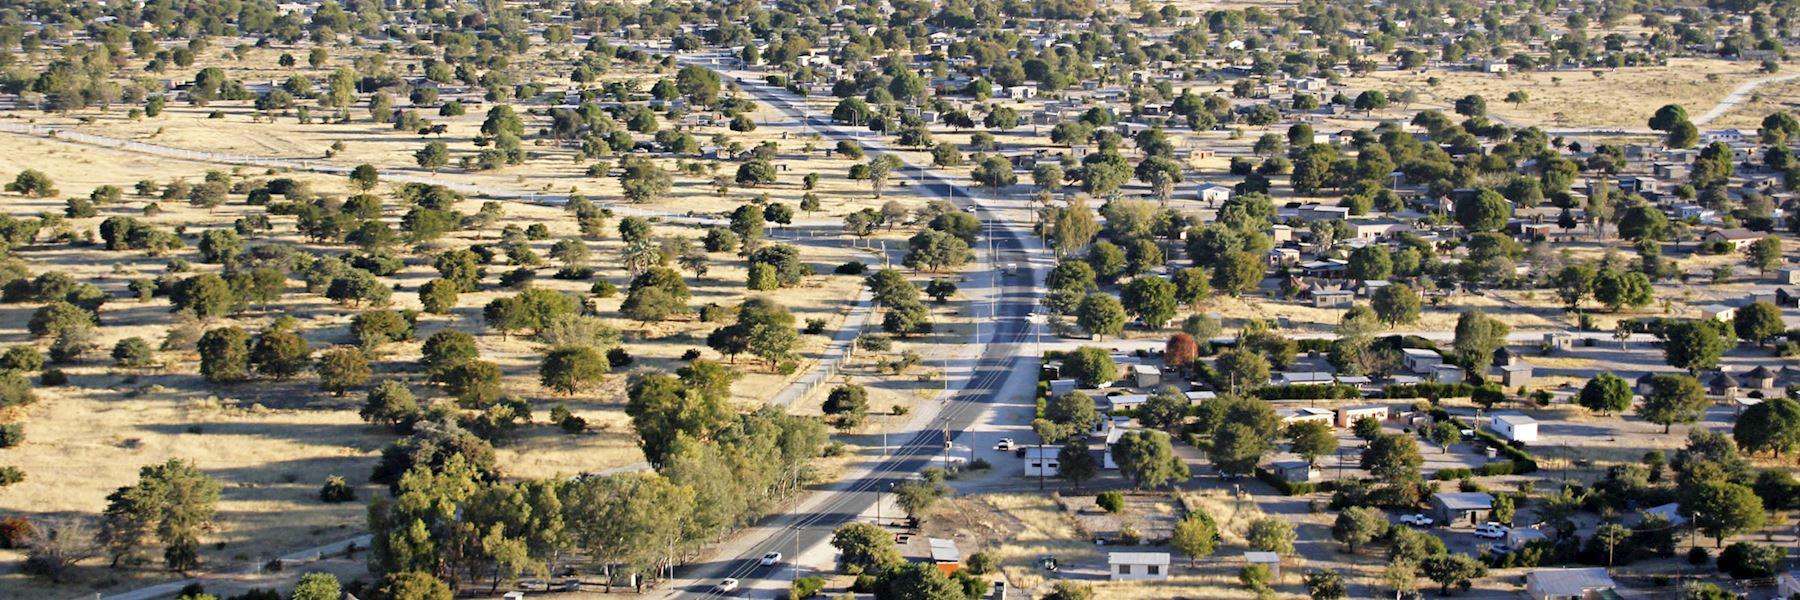 Visit Maun On A Trip To Botswana Audley Travel